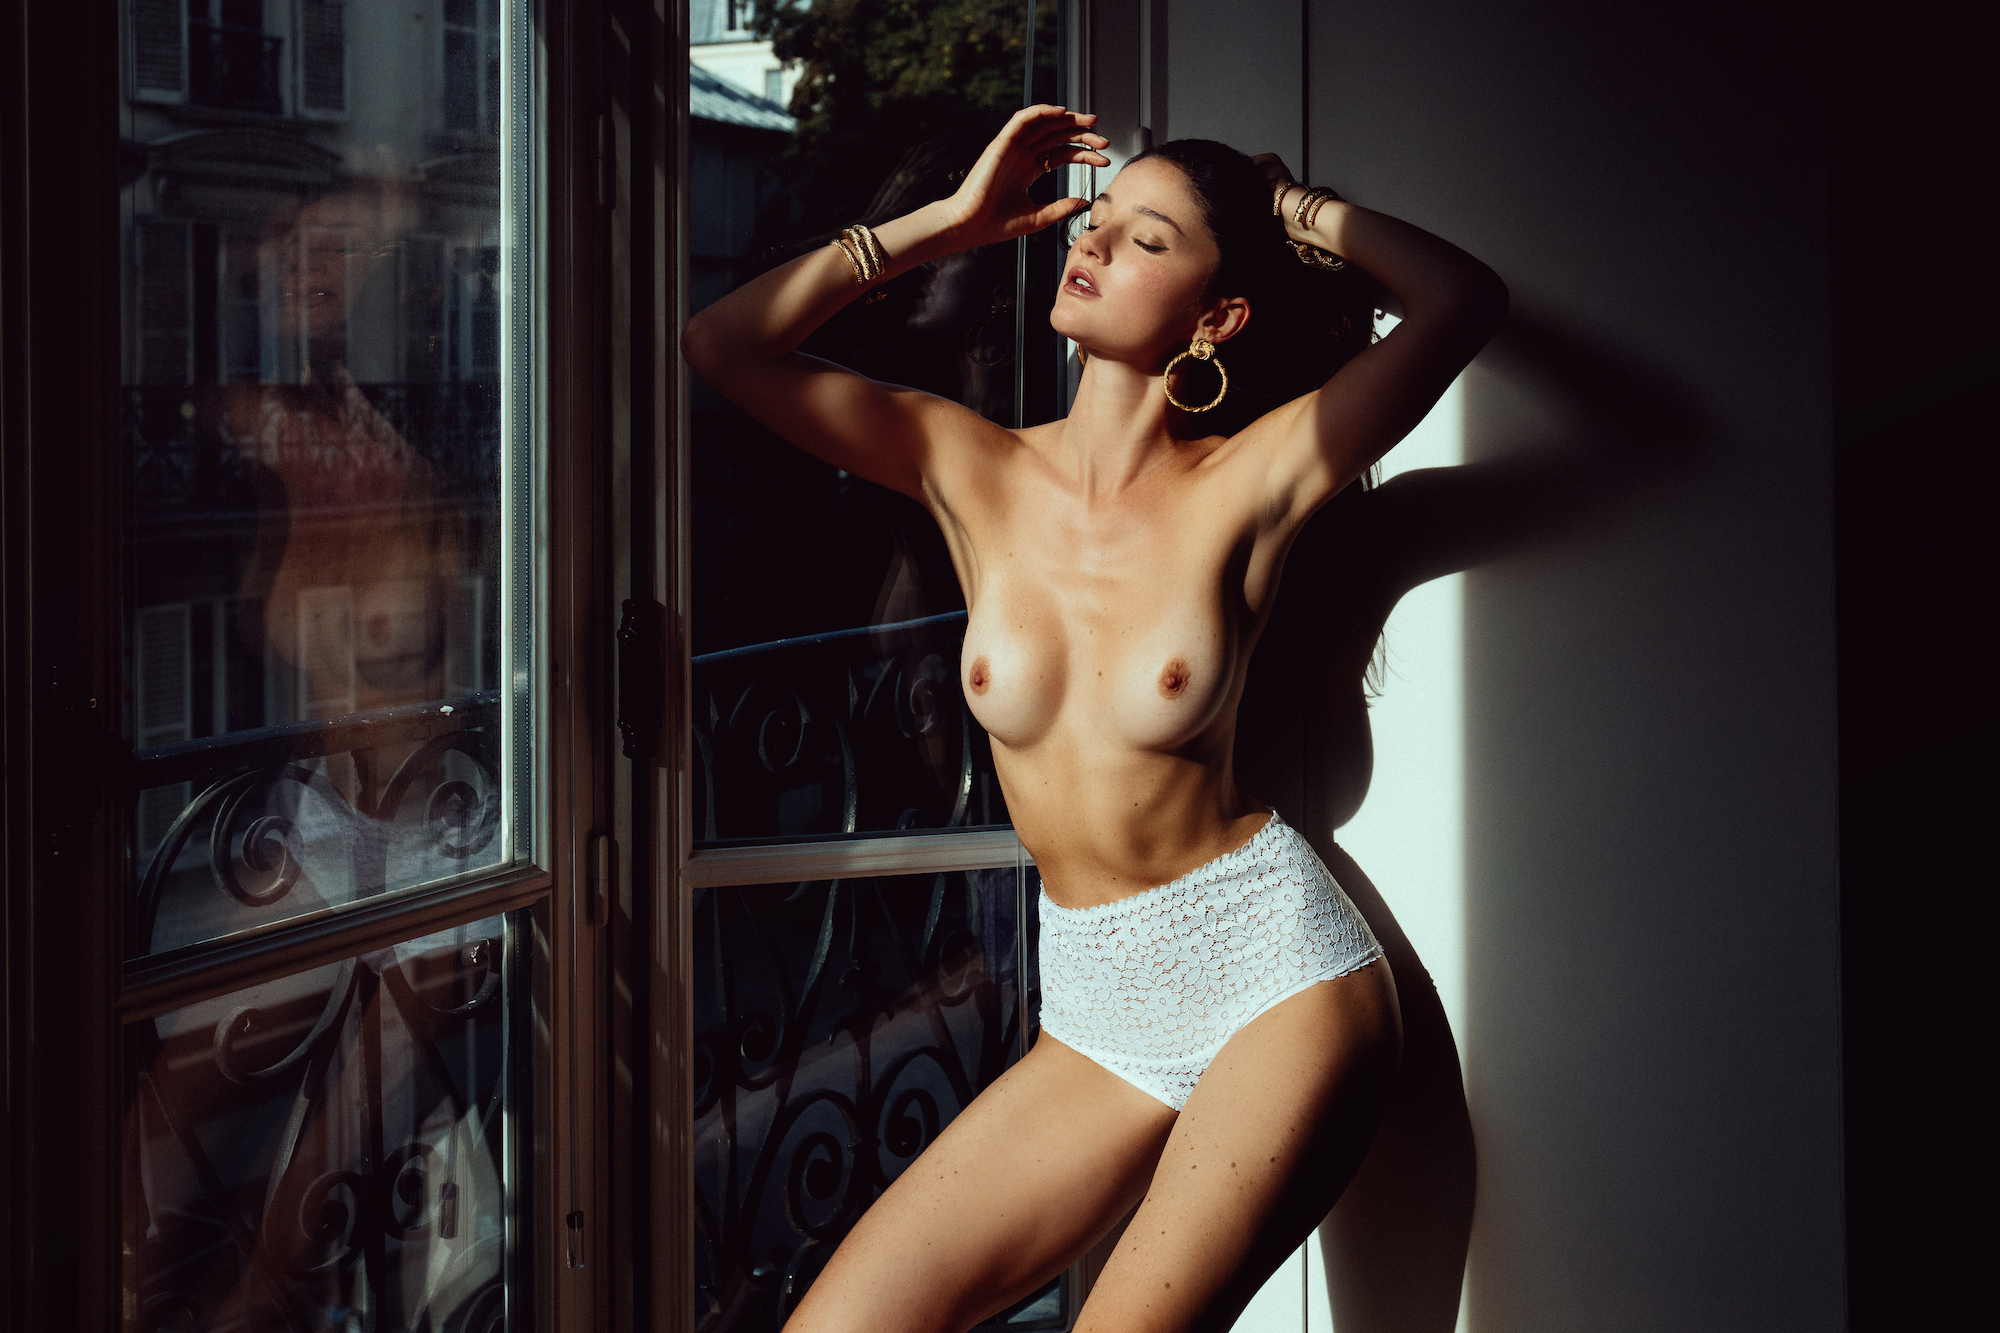 Ana Walczak Nude chloe bechini - portraits of girls